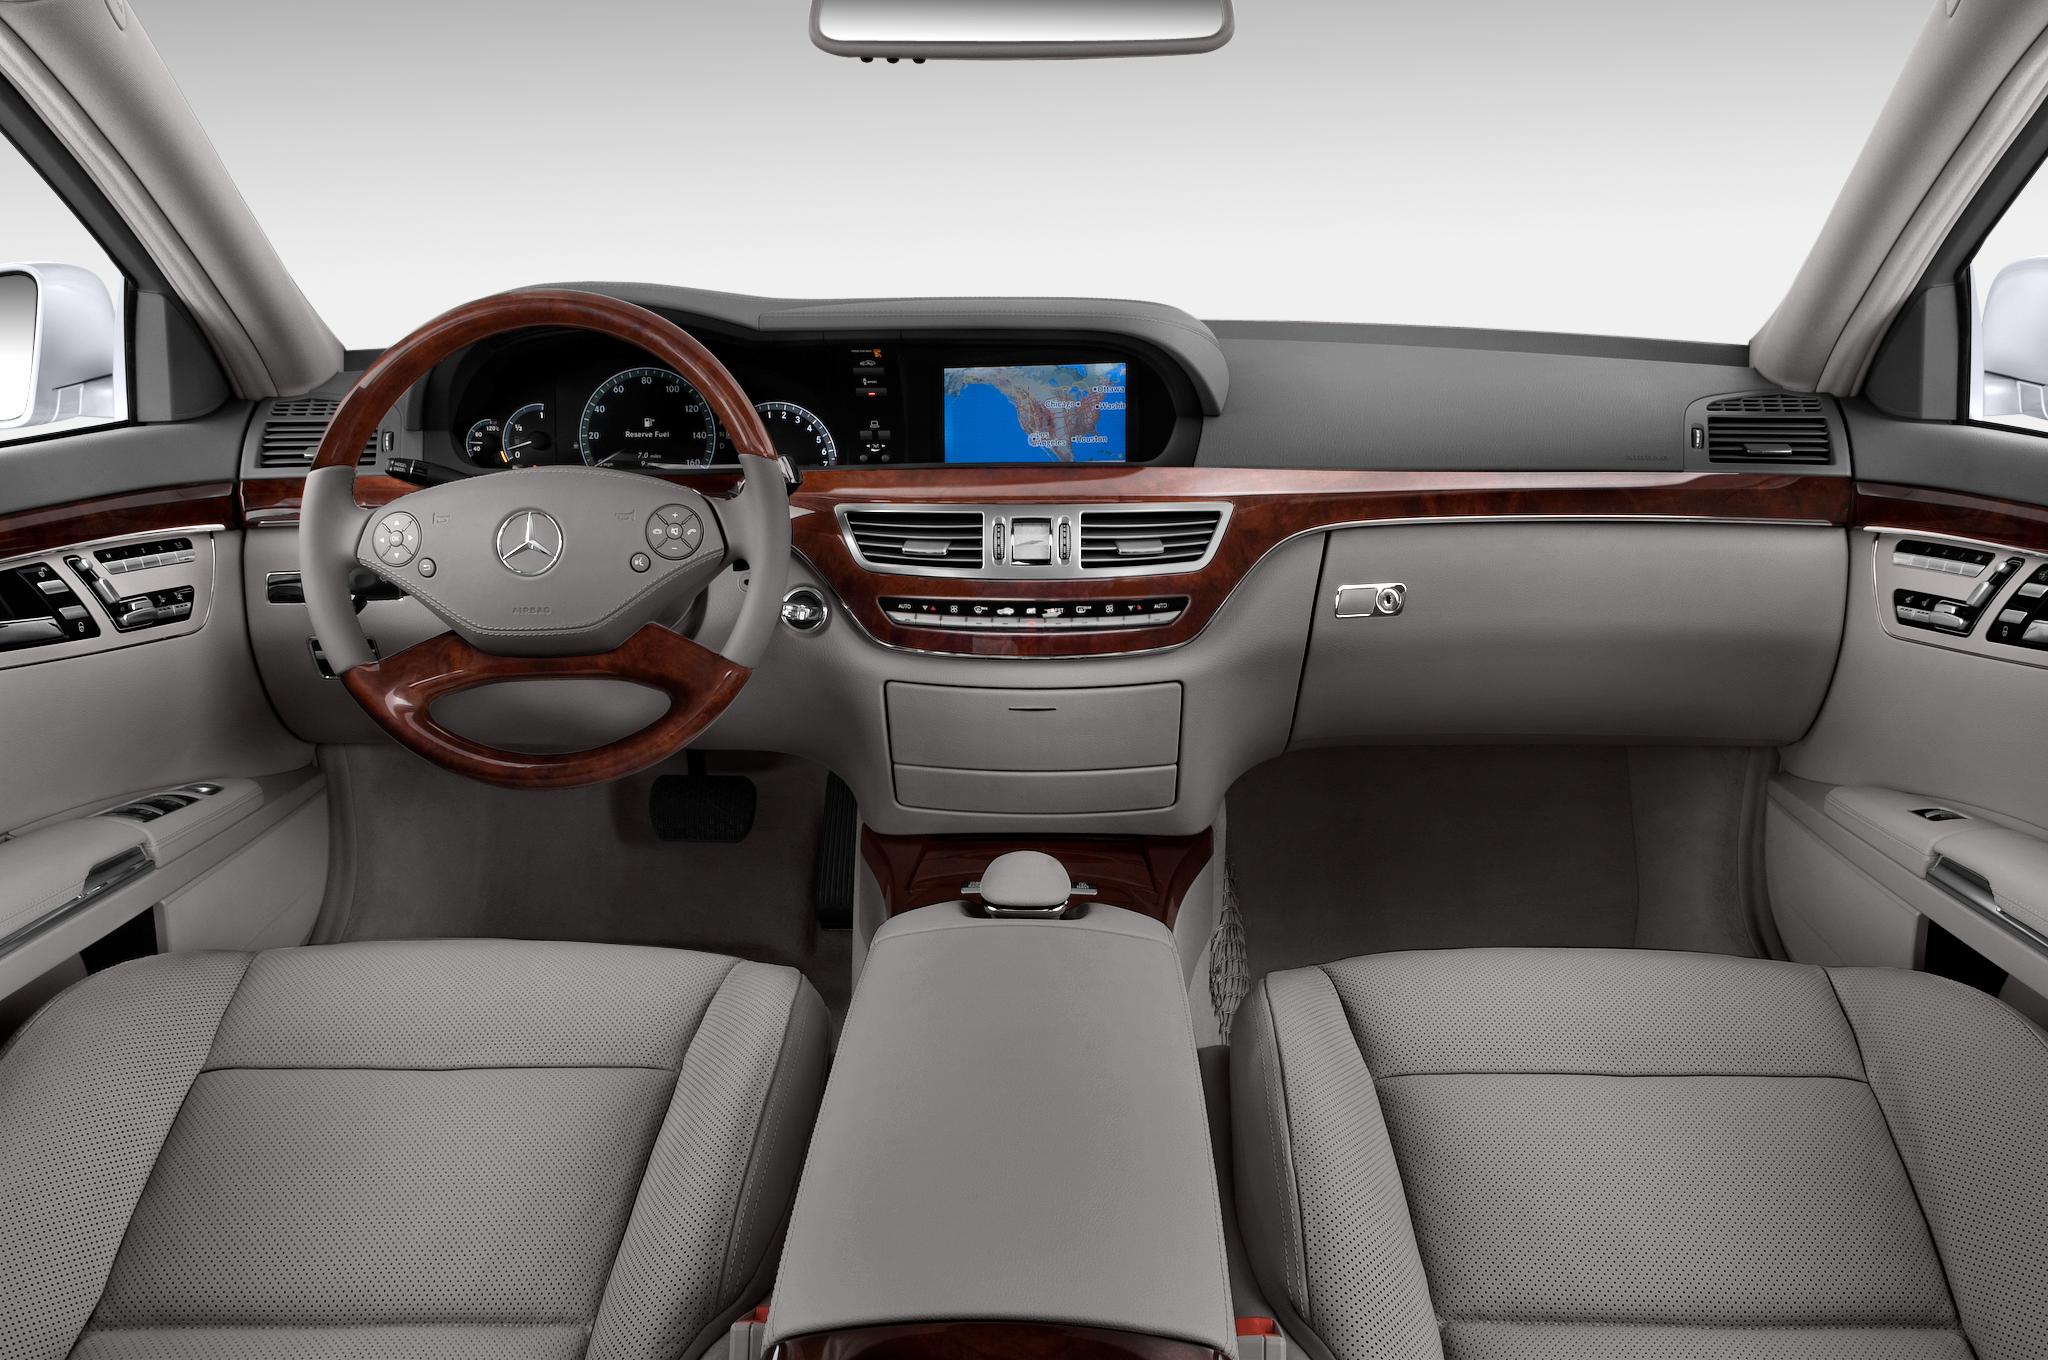 2010 Mercedes Benz S400 Hybrid Luxury Sedan S550 Fuse Box Diagram 41 50